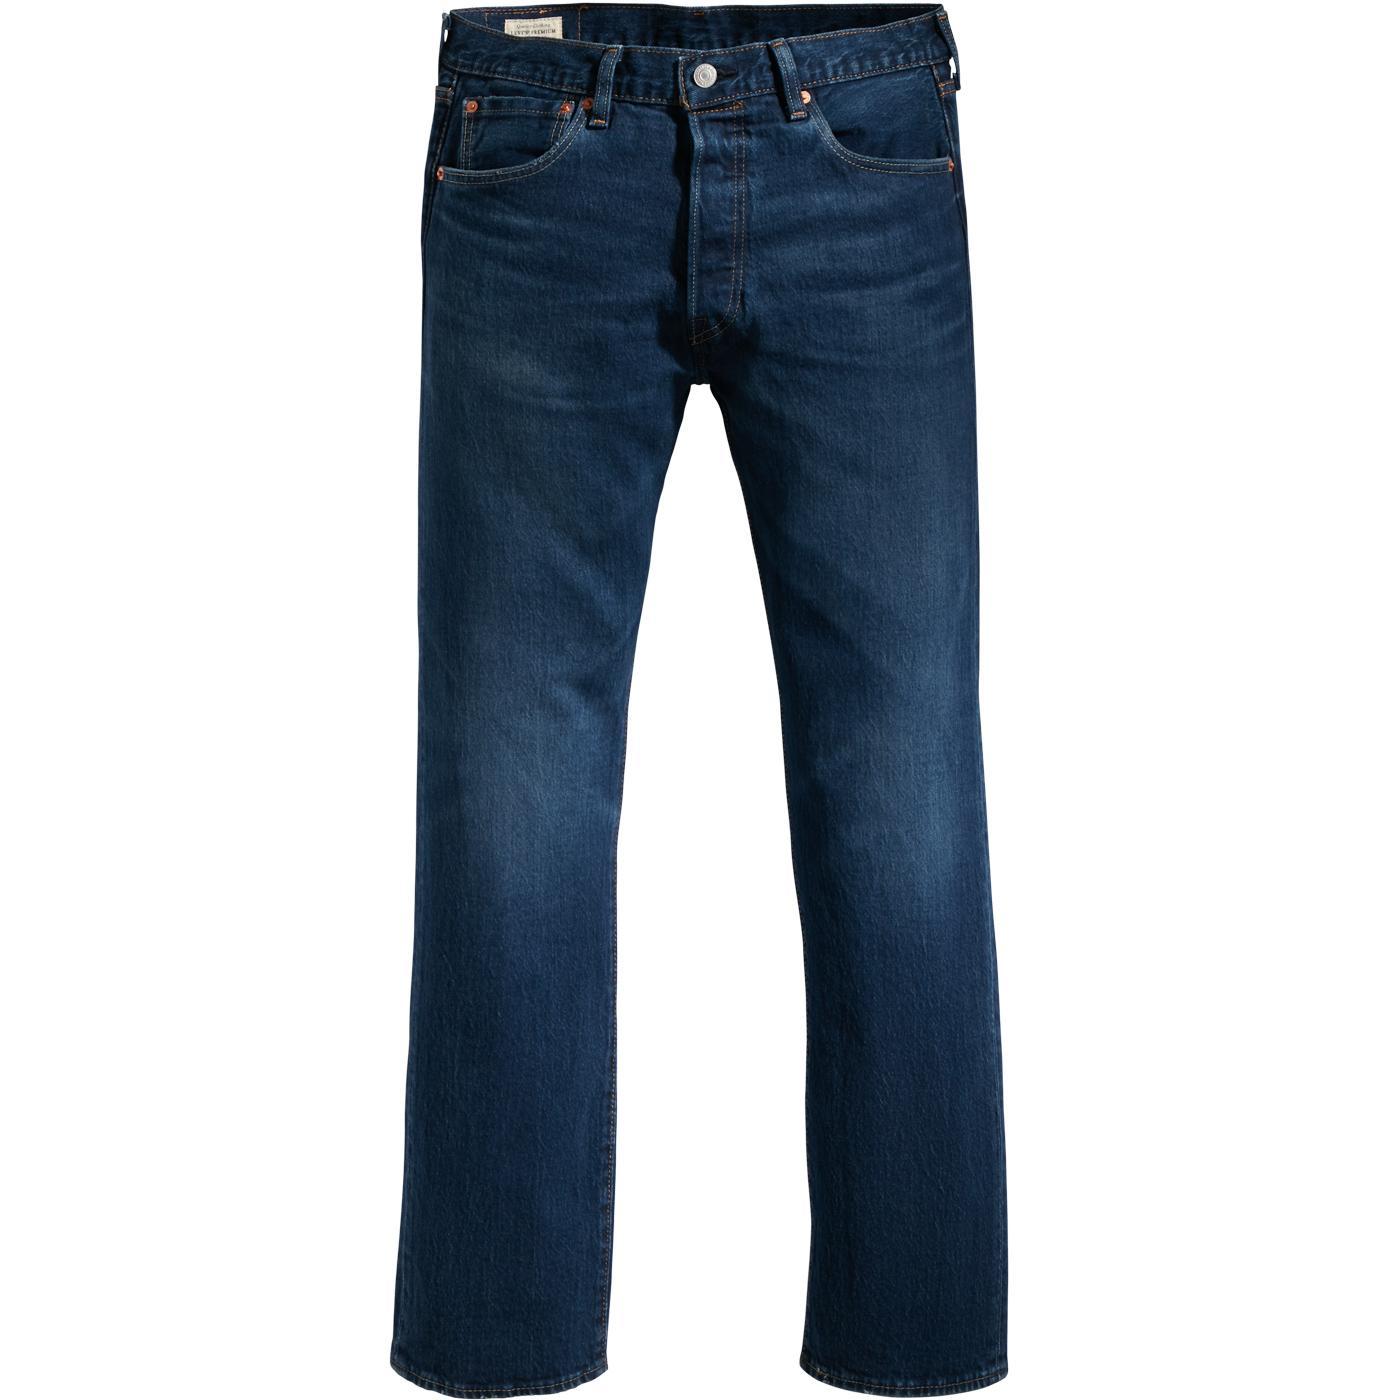 LEVI'S 501 Original Straight Leg Jeans (Miami Sky)